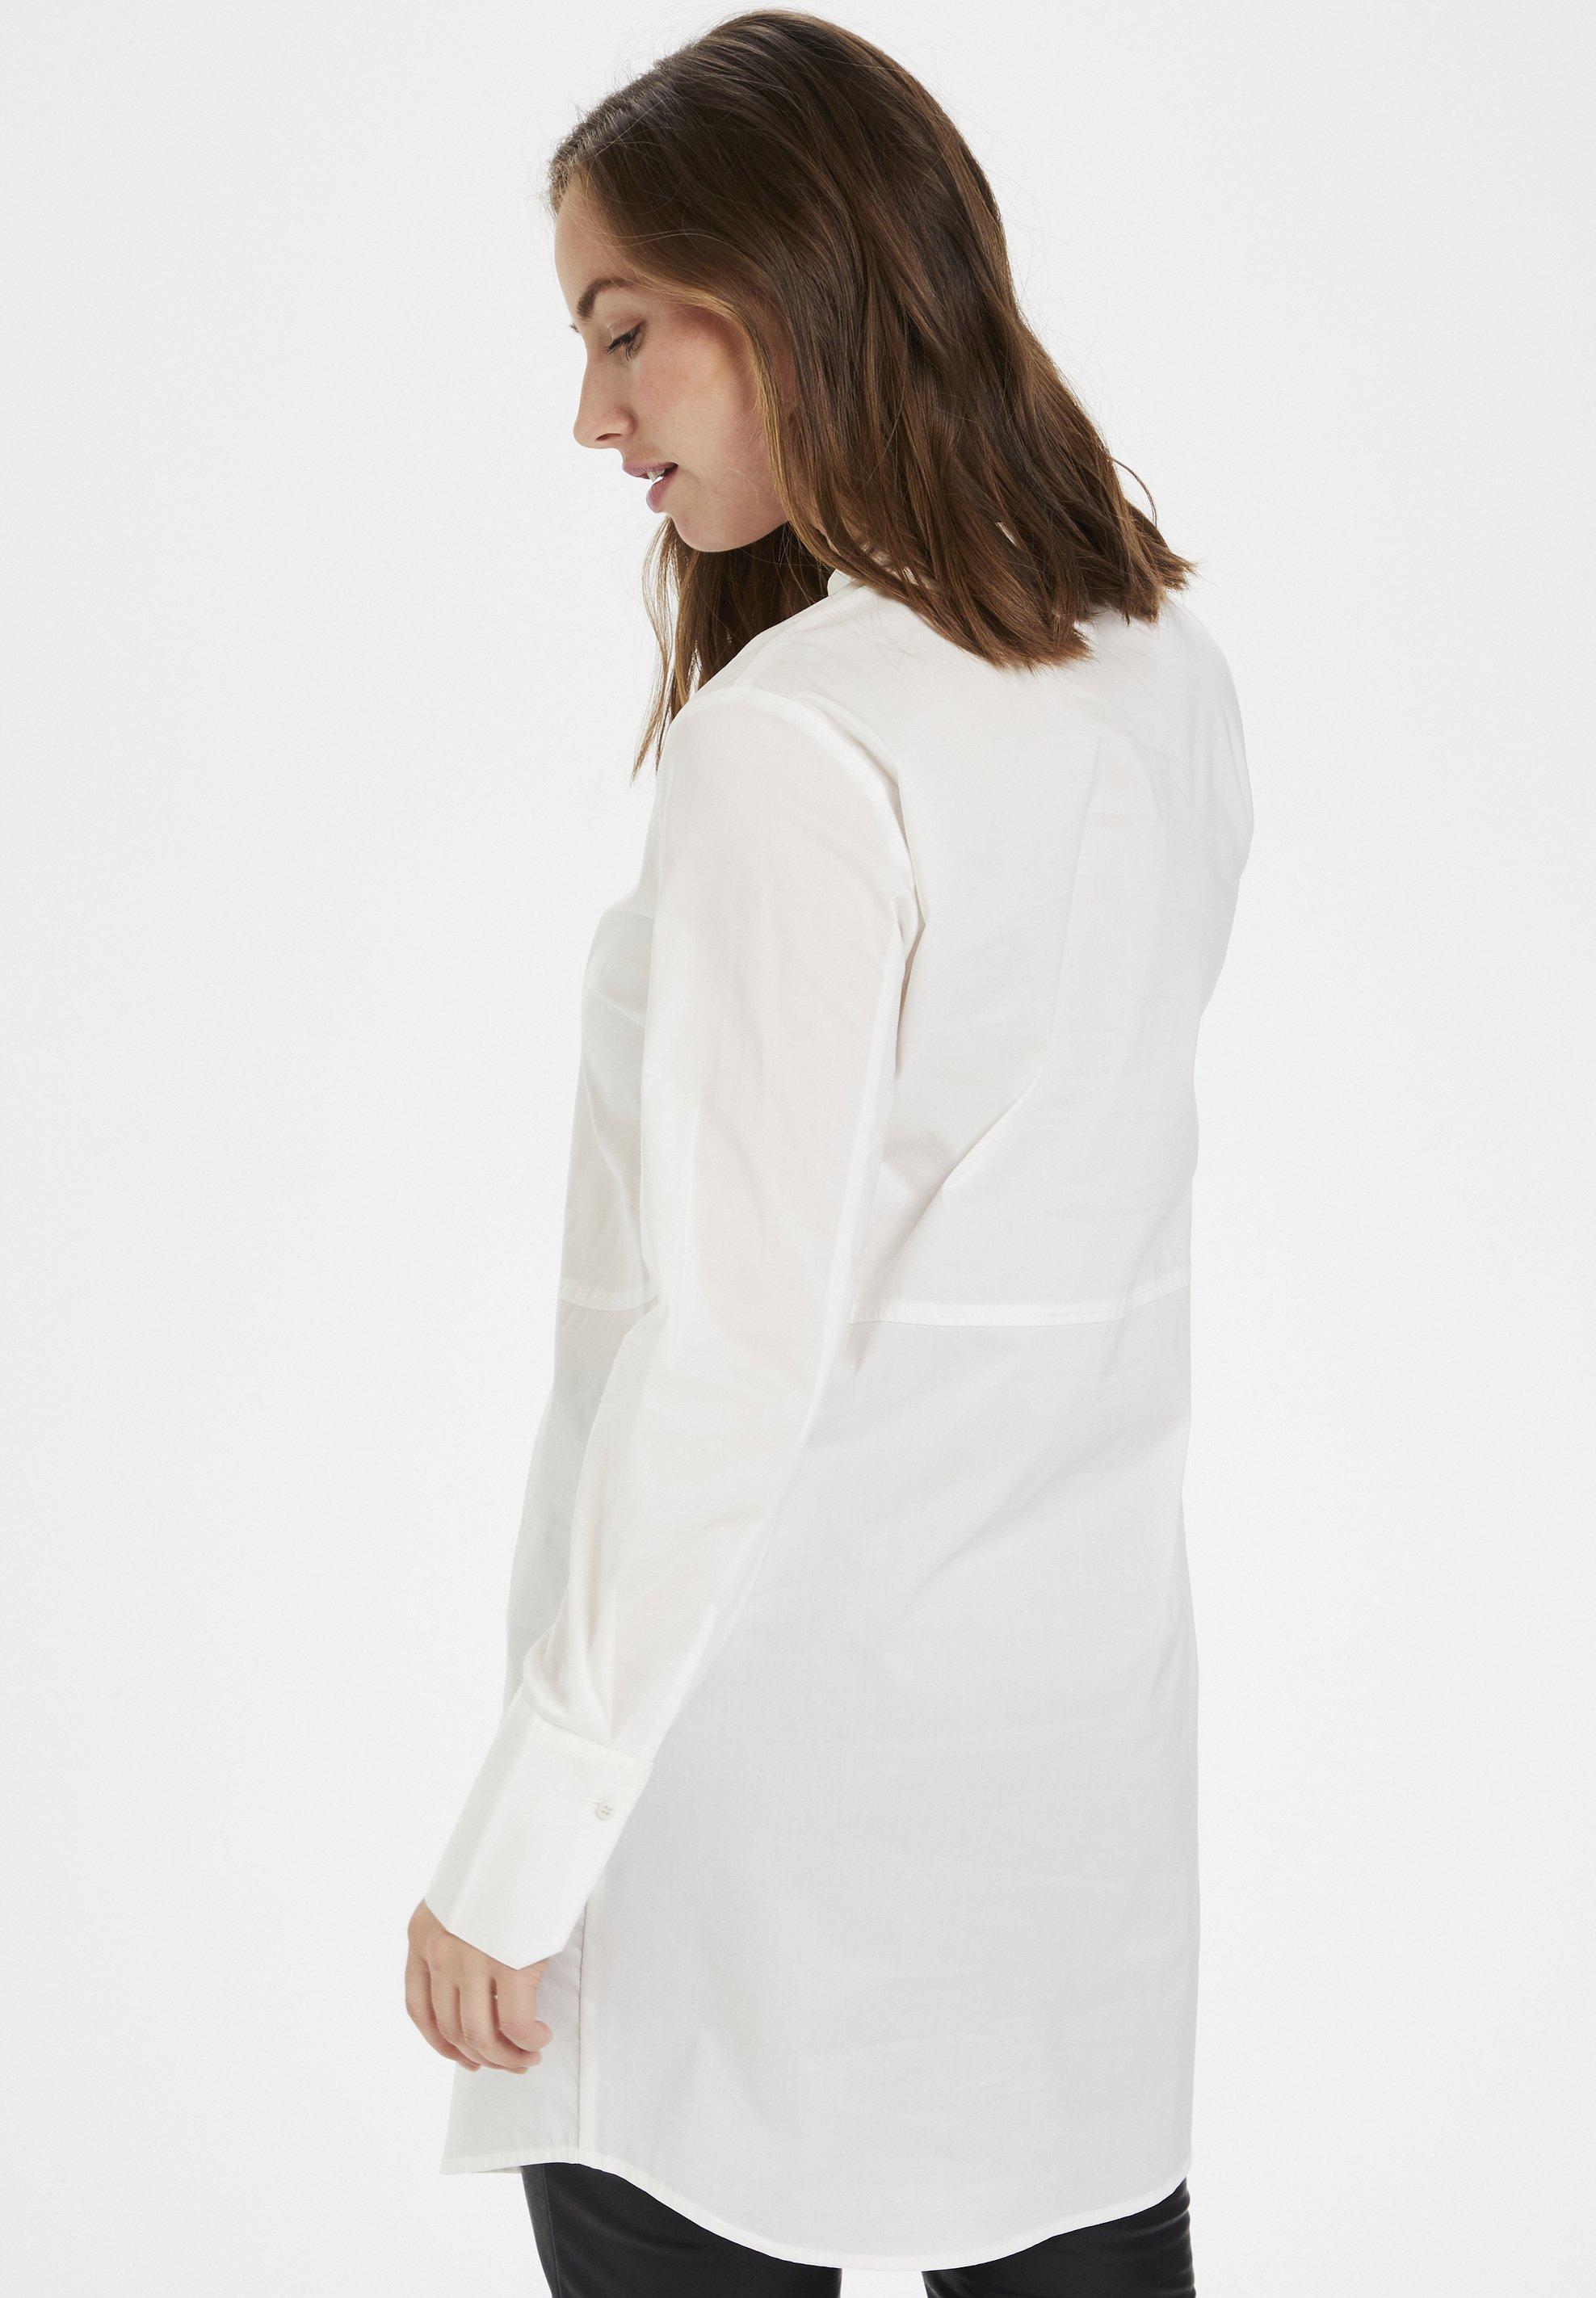 Donna CUANTONIETT LONG SHIRT - Camicia